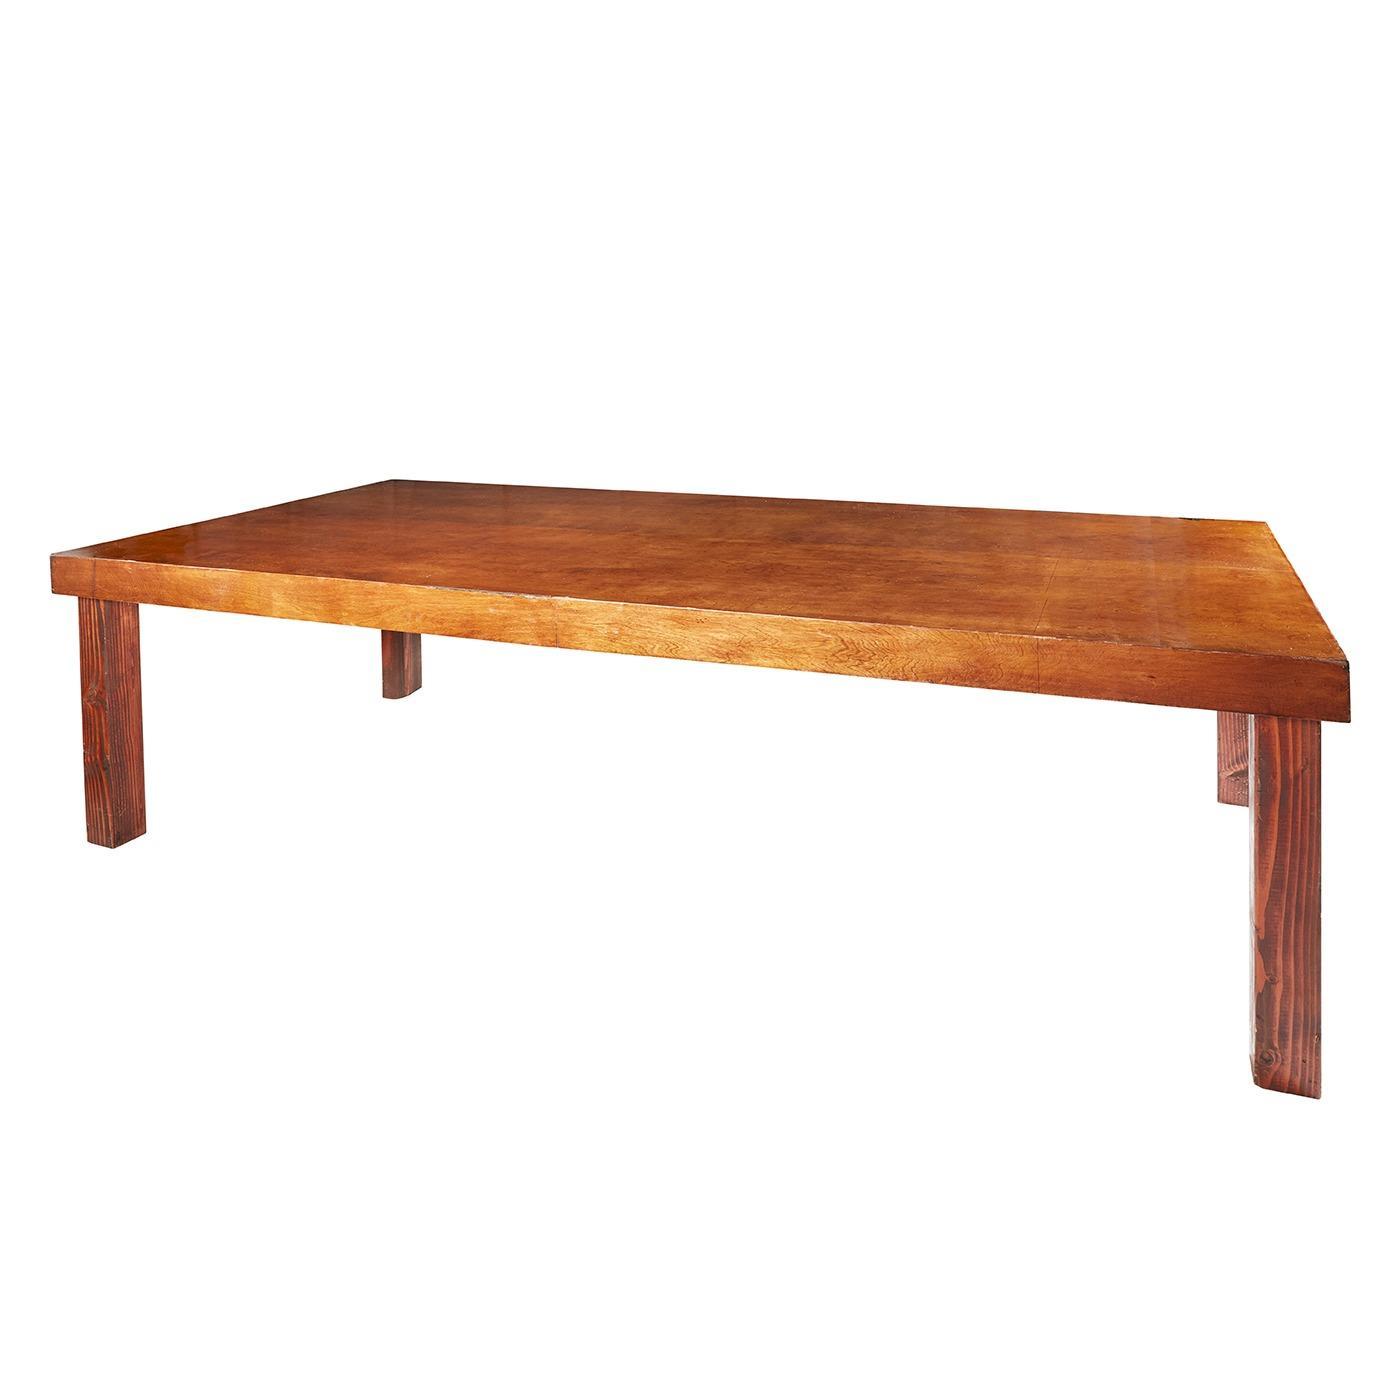 "Mahogany Table - 8'L x 48""W x 30""H"